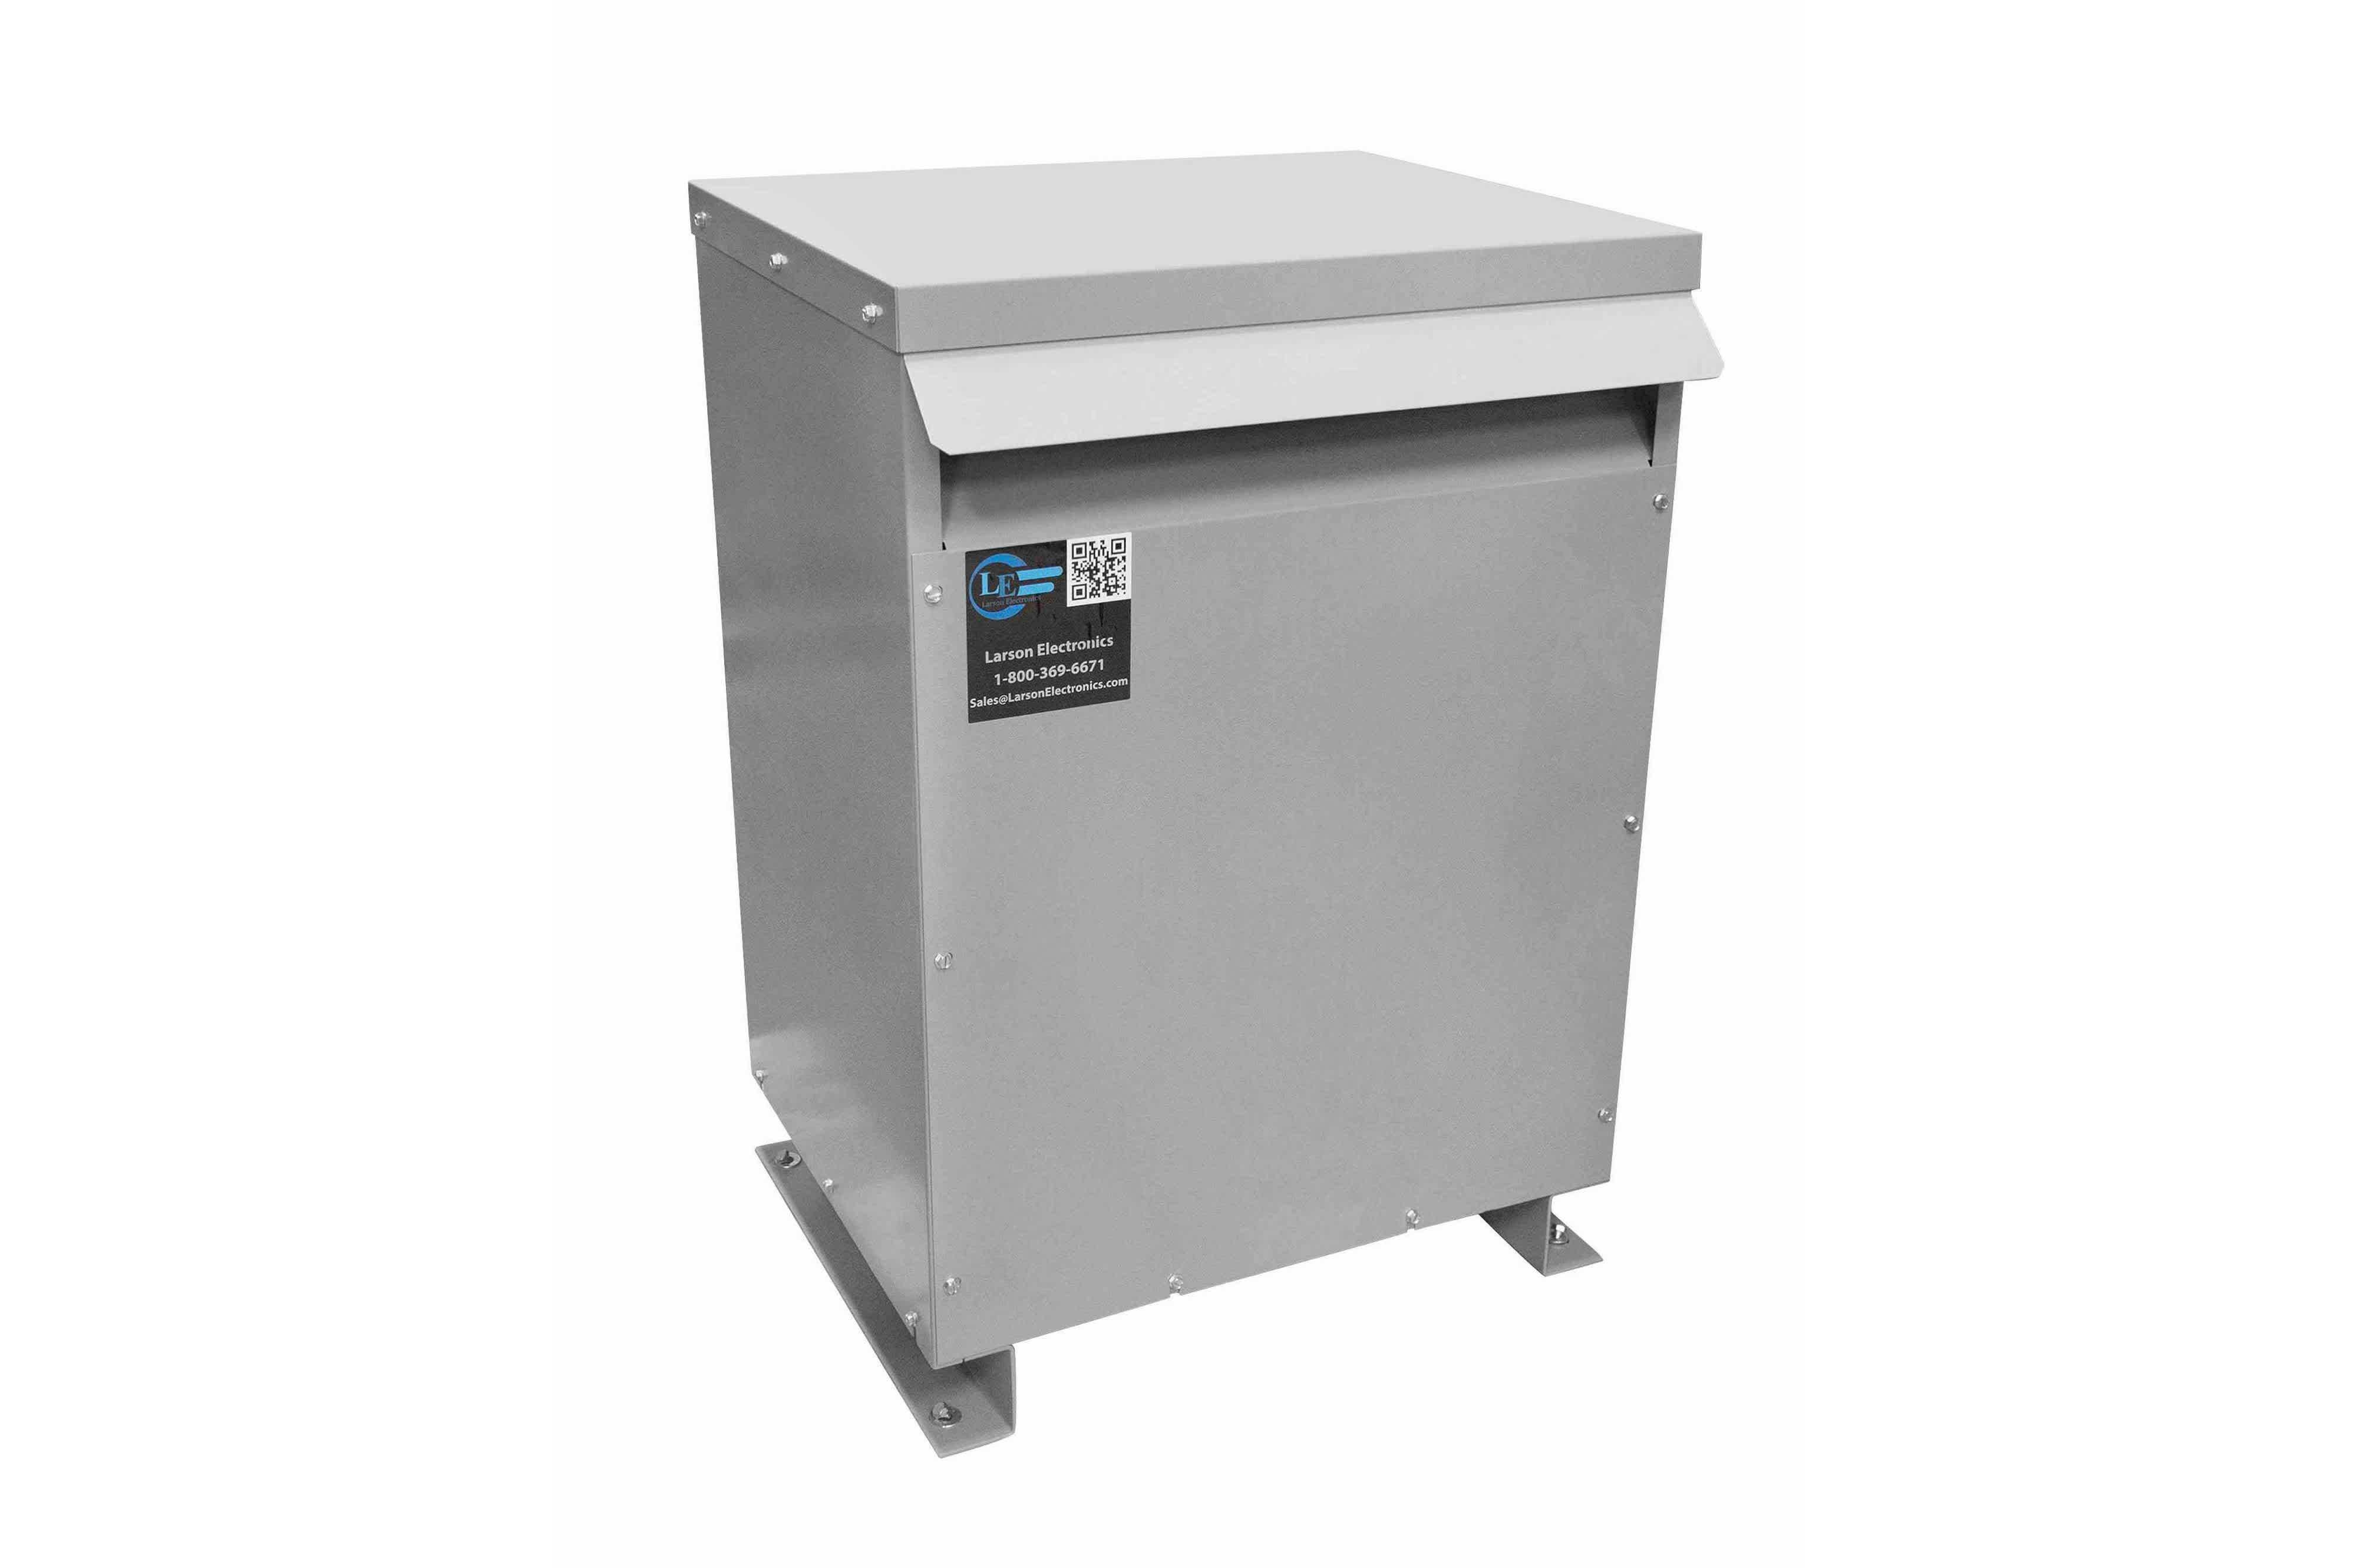 115 kVA 3PH Isolation Transformer, 460V Wye Primary, 400Y/231 Wye-N Secondary, N3R, Ventilated, 60 Hz